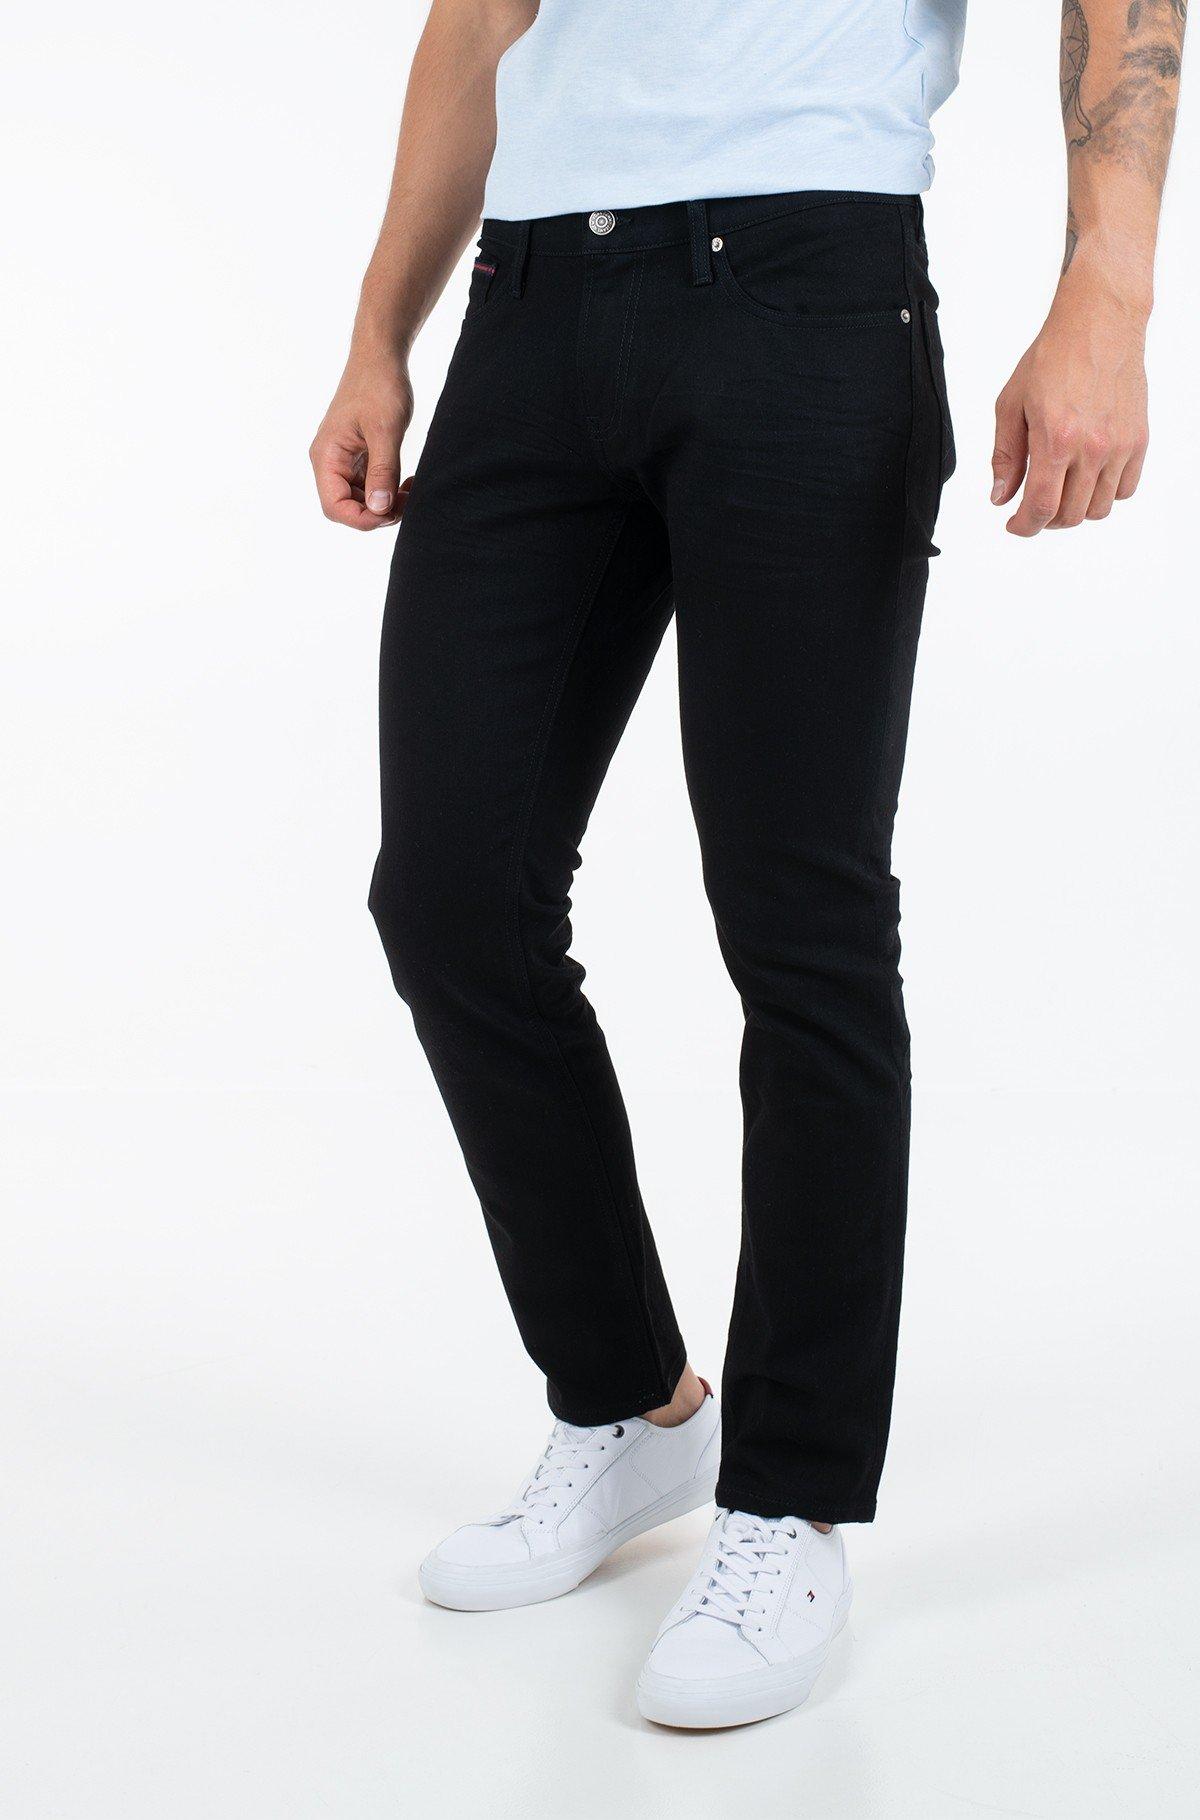 Jeans Slim Scanton BLCO-full-1